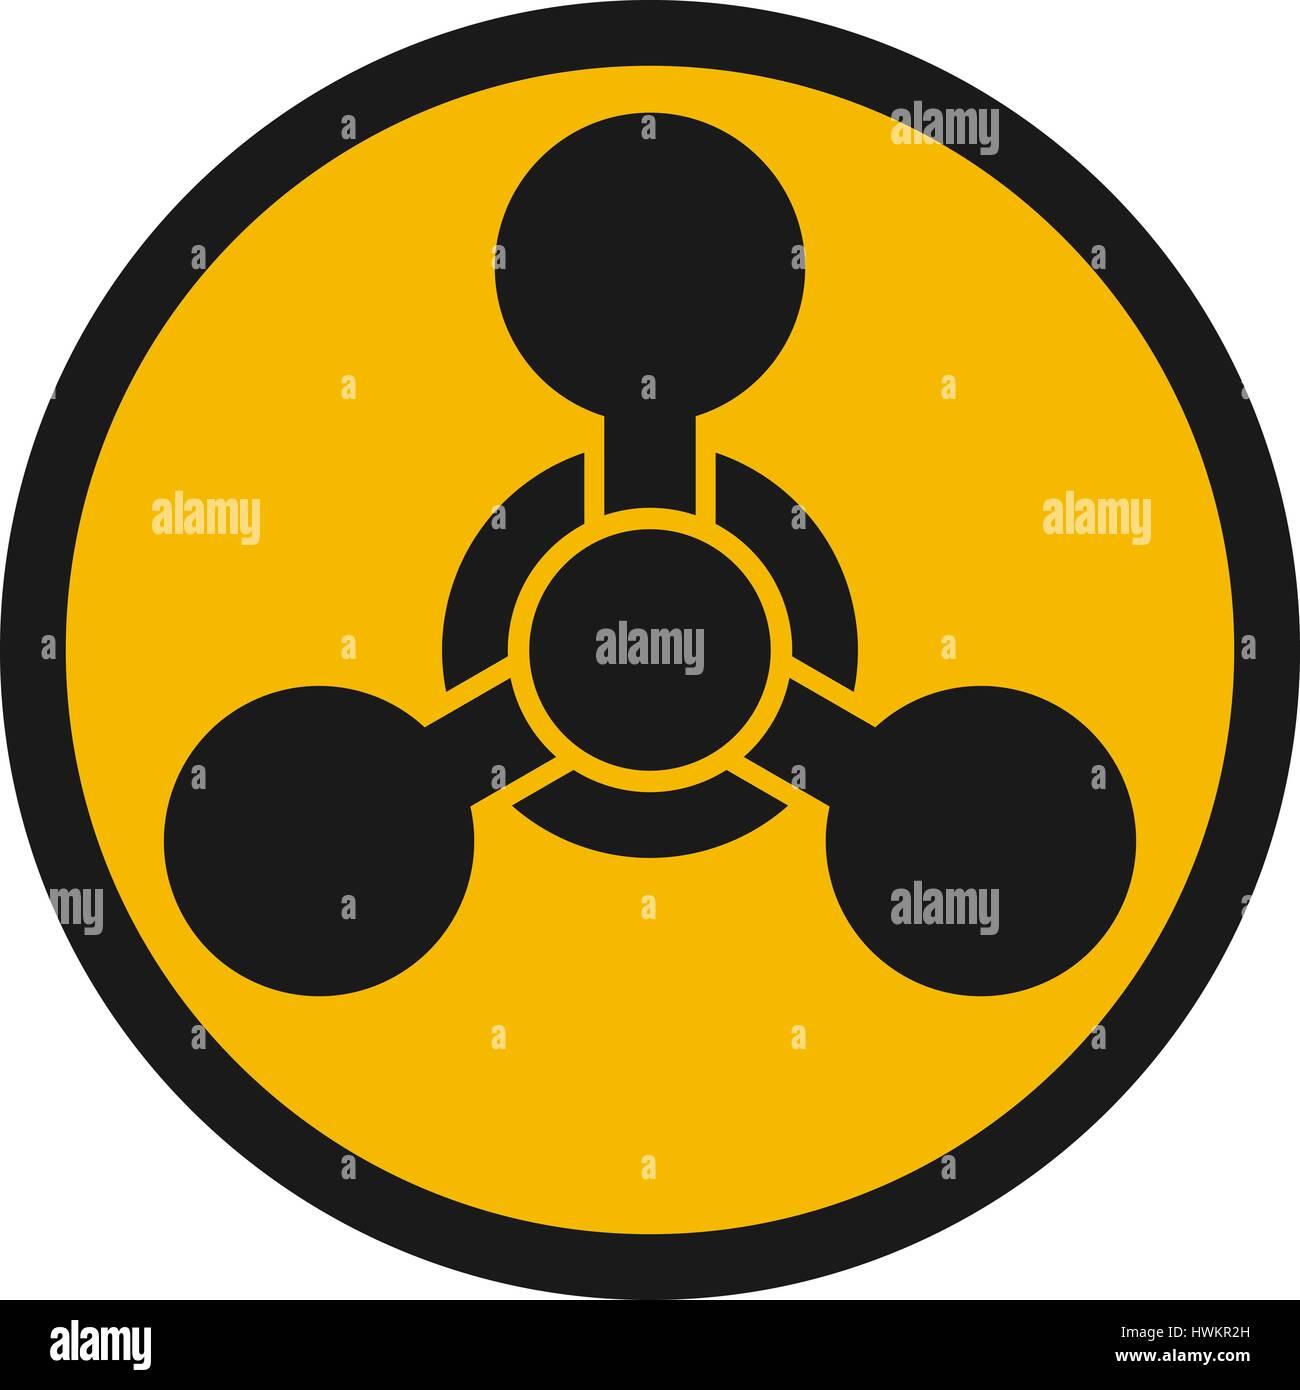 chemical weapon warning hazard sign stock vector art illustration